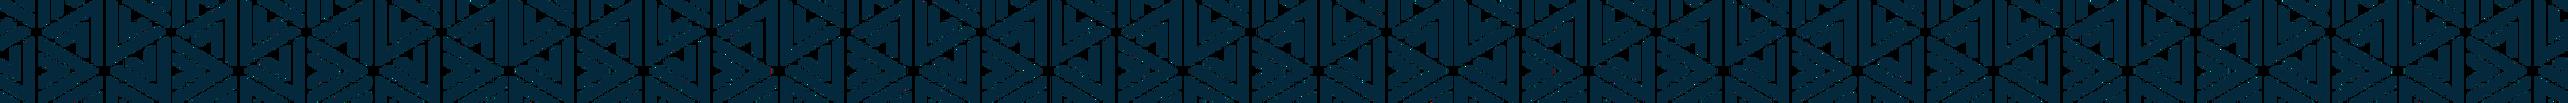 jfi_web_patterns_1895x75_Arrows-1391D0_edited.png